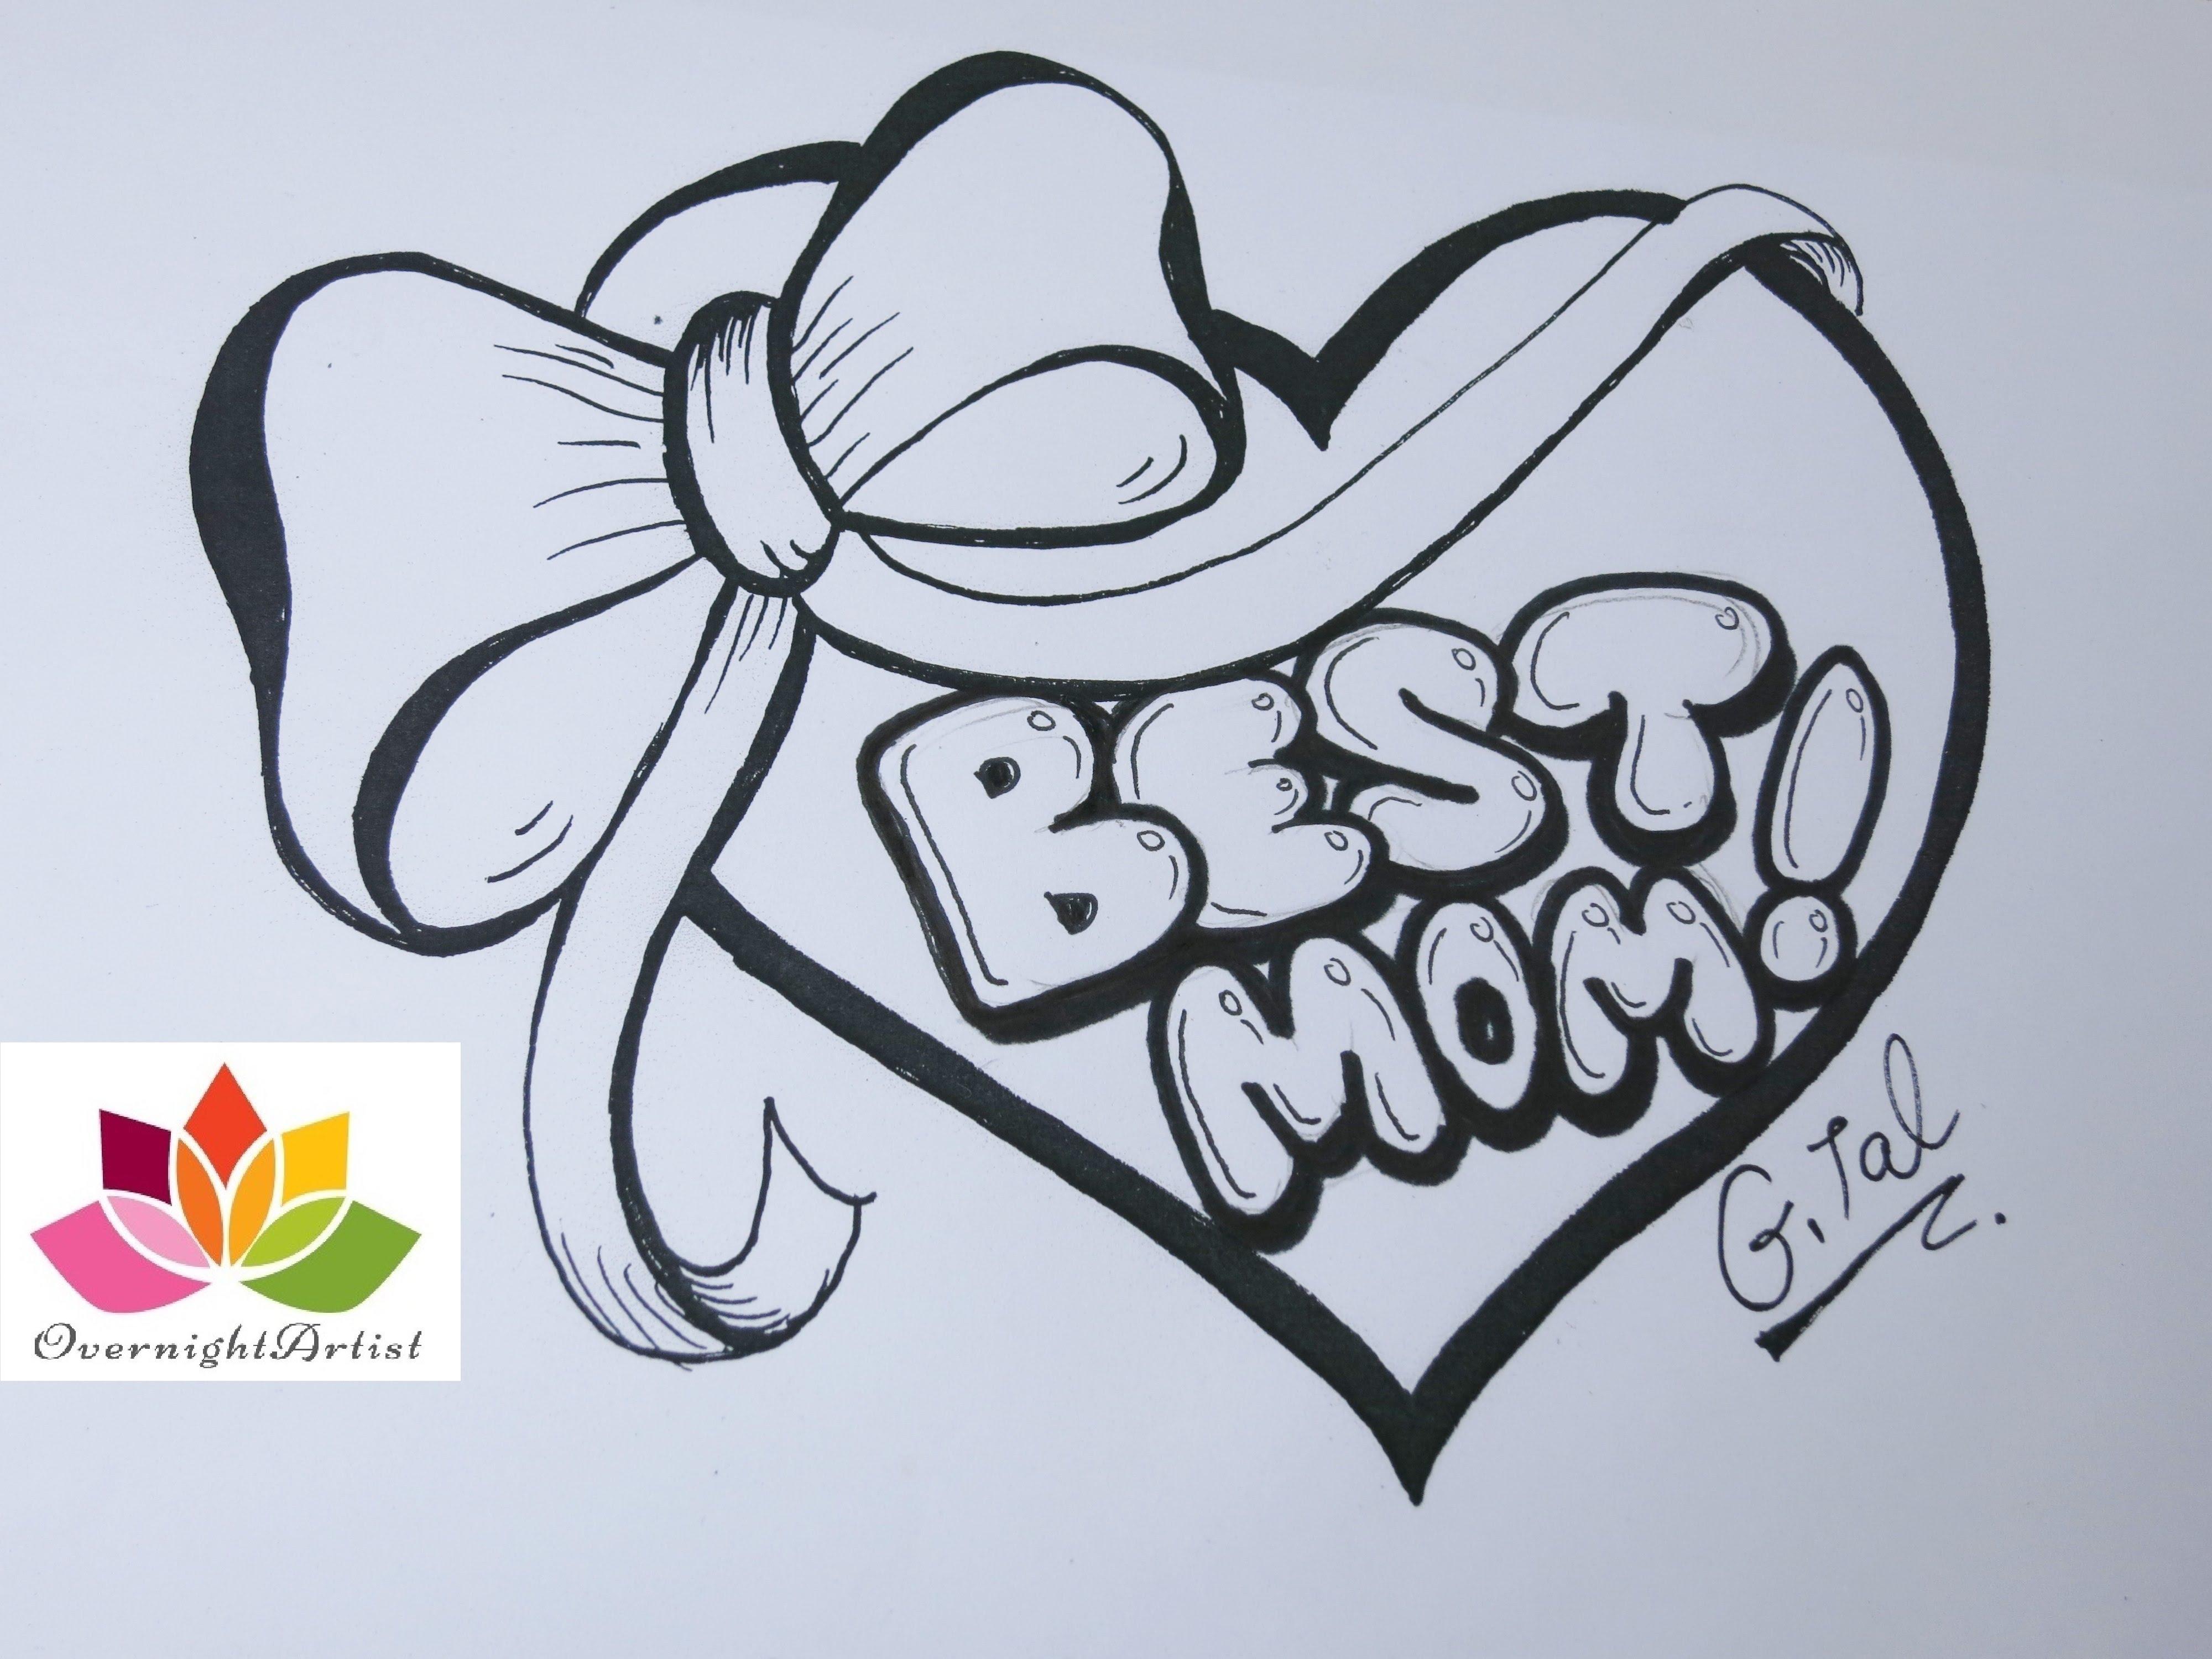 4000x3000 I Love You Mom Graffiti Draw Best Mom On A Heart, Puffy Ribbon Bow